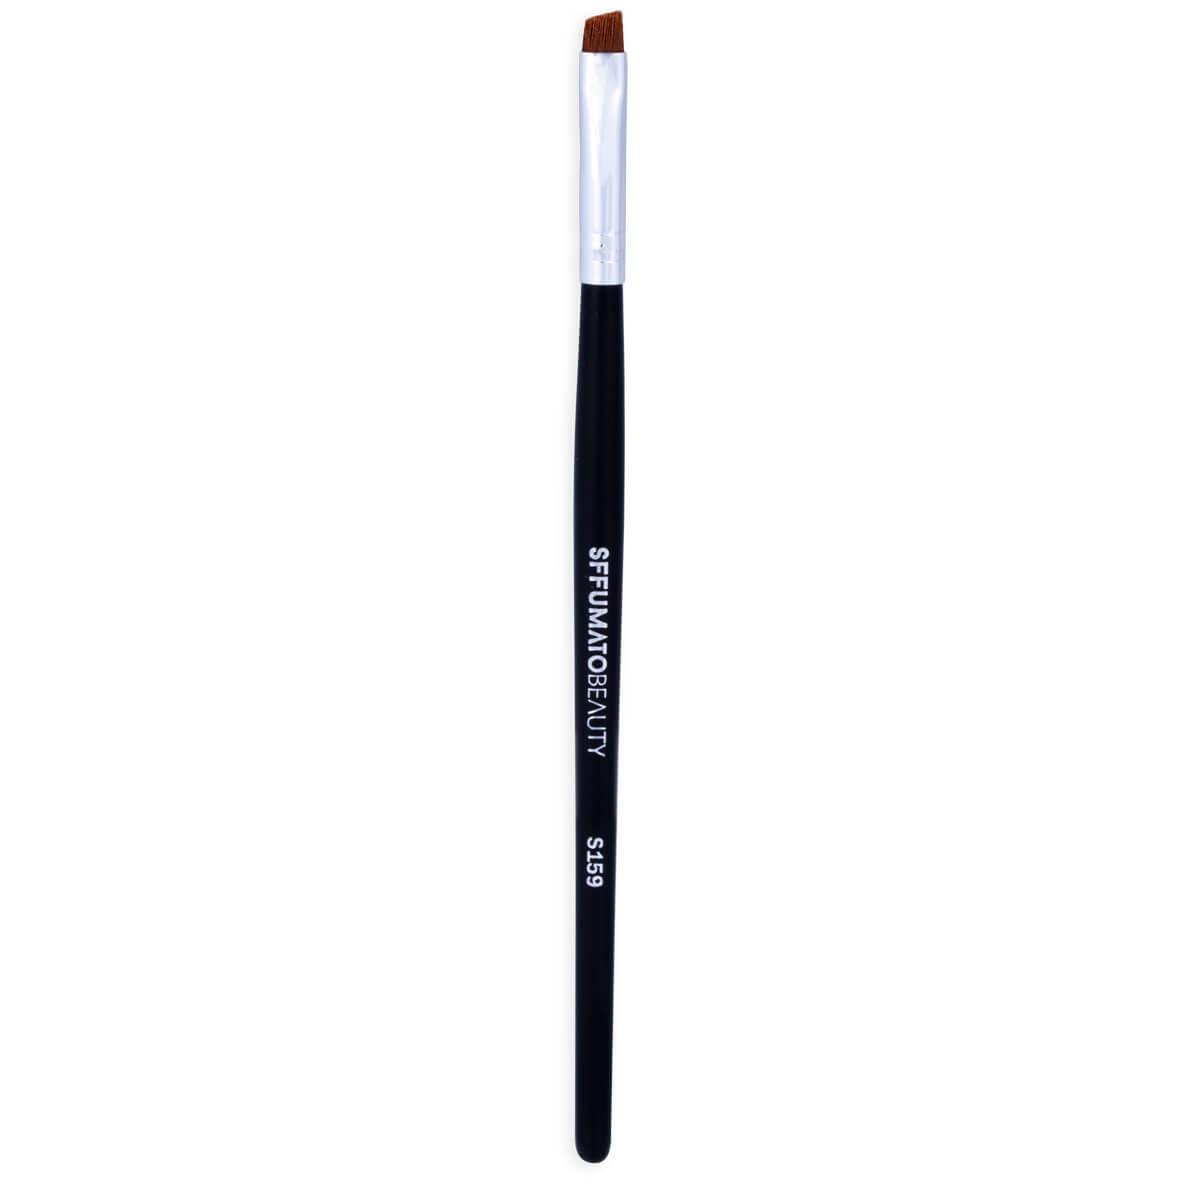 S159 - Pincel Chanfrado Para Delinear Pequeno Profissional Sffumato Beauty